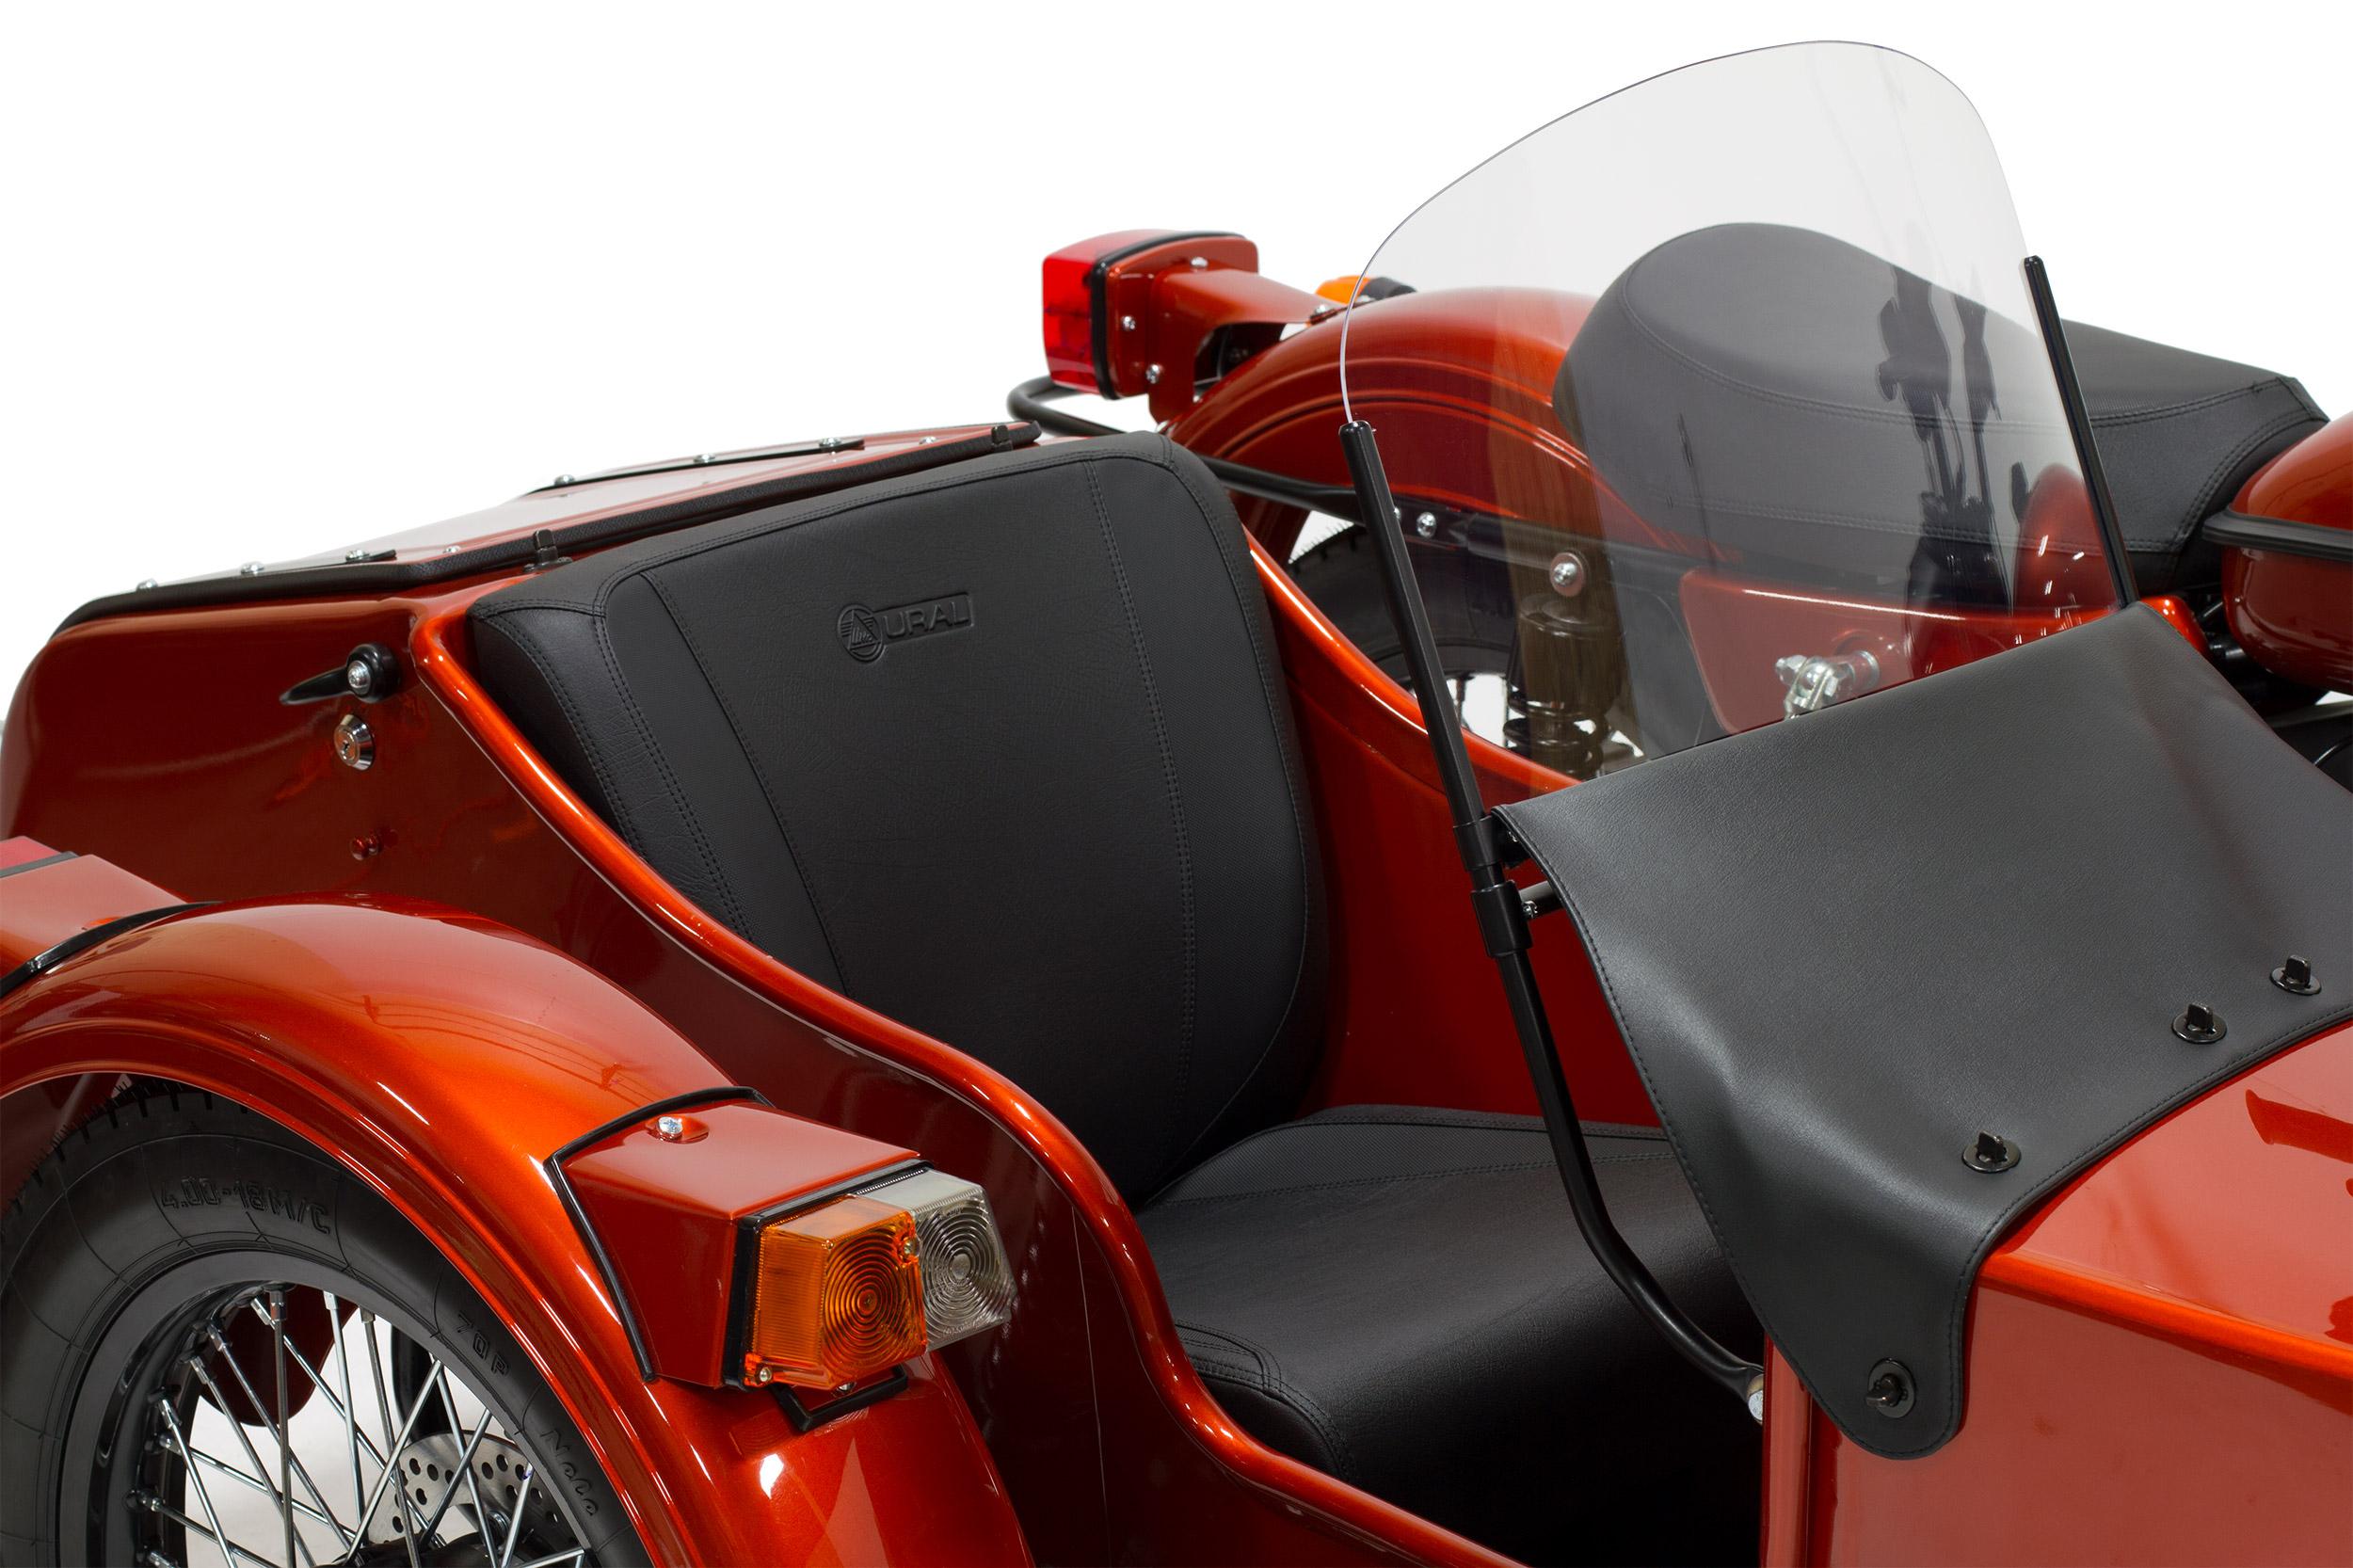 Seat Windshield Detail (1).jpg